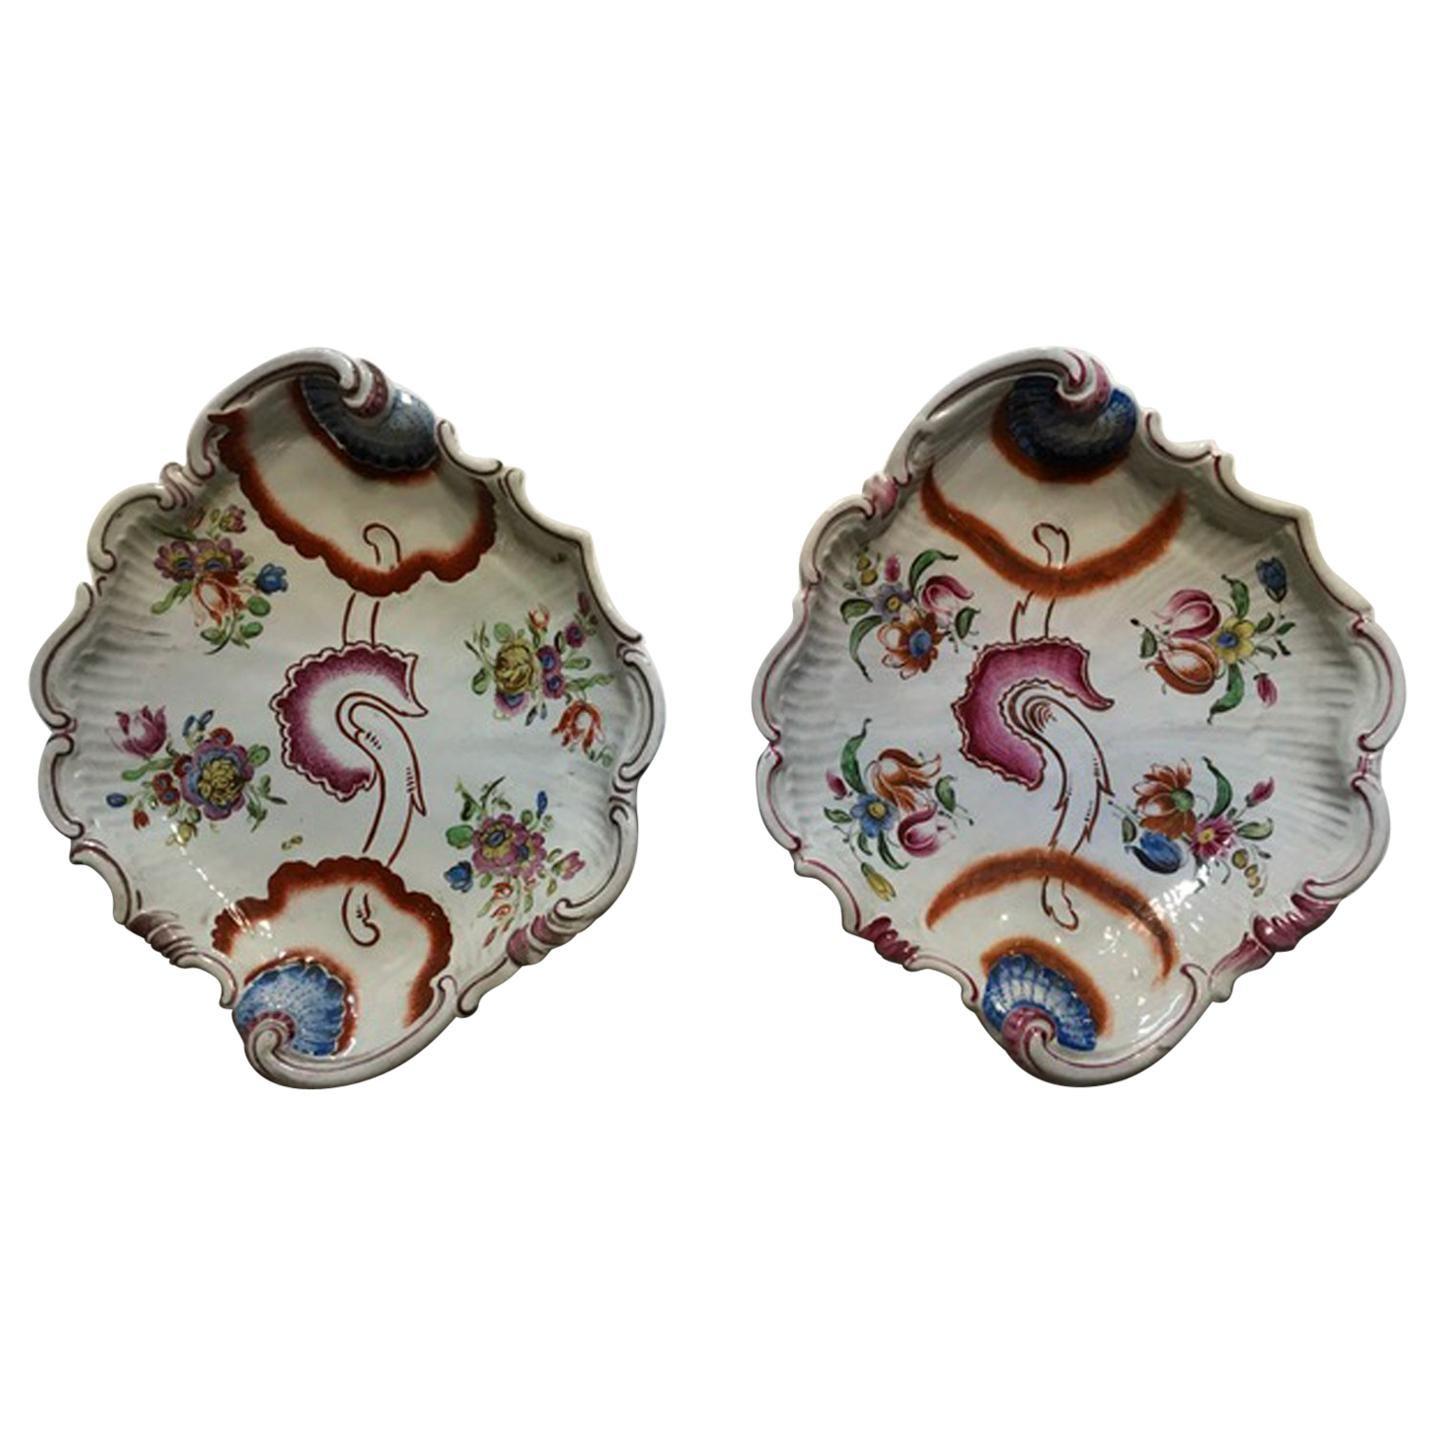 Italy Richard Ginori 1750 Pair of Porcelain Bowls Pink Tulips Drawings Doccia